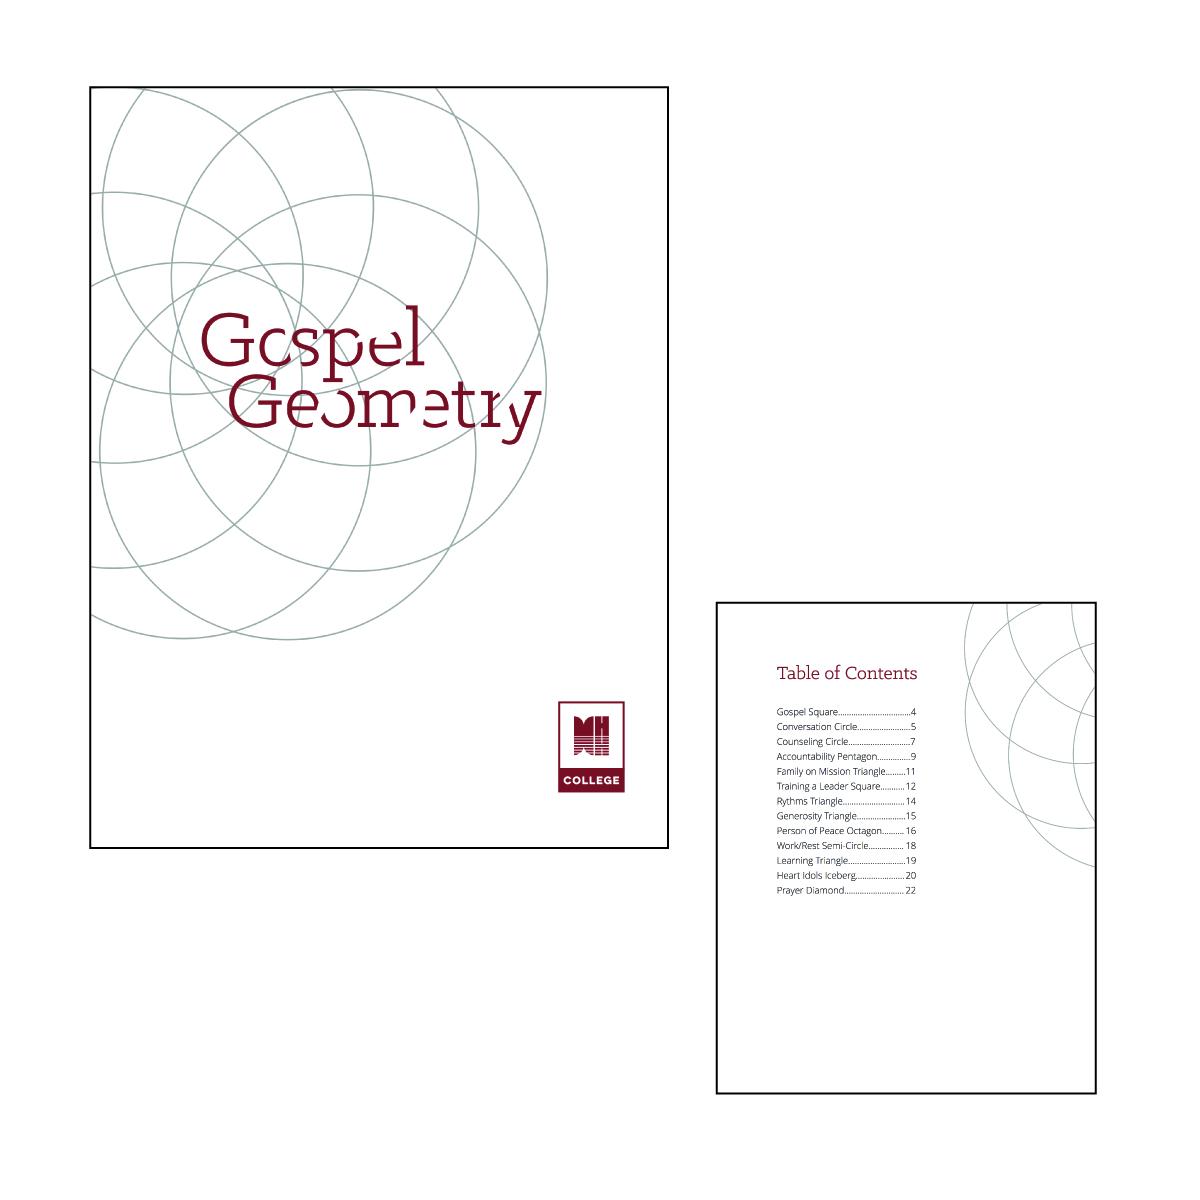 gg-01.jpg